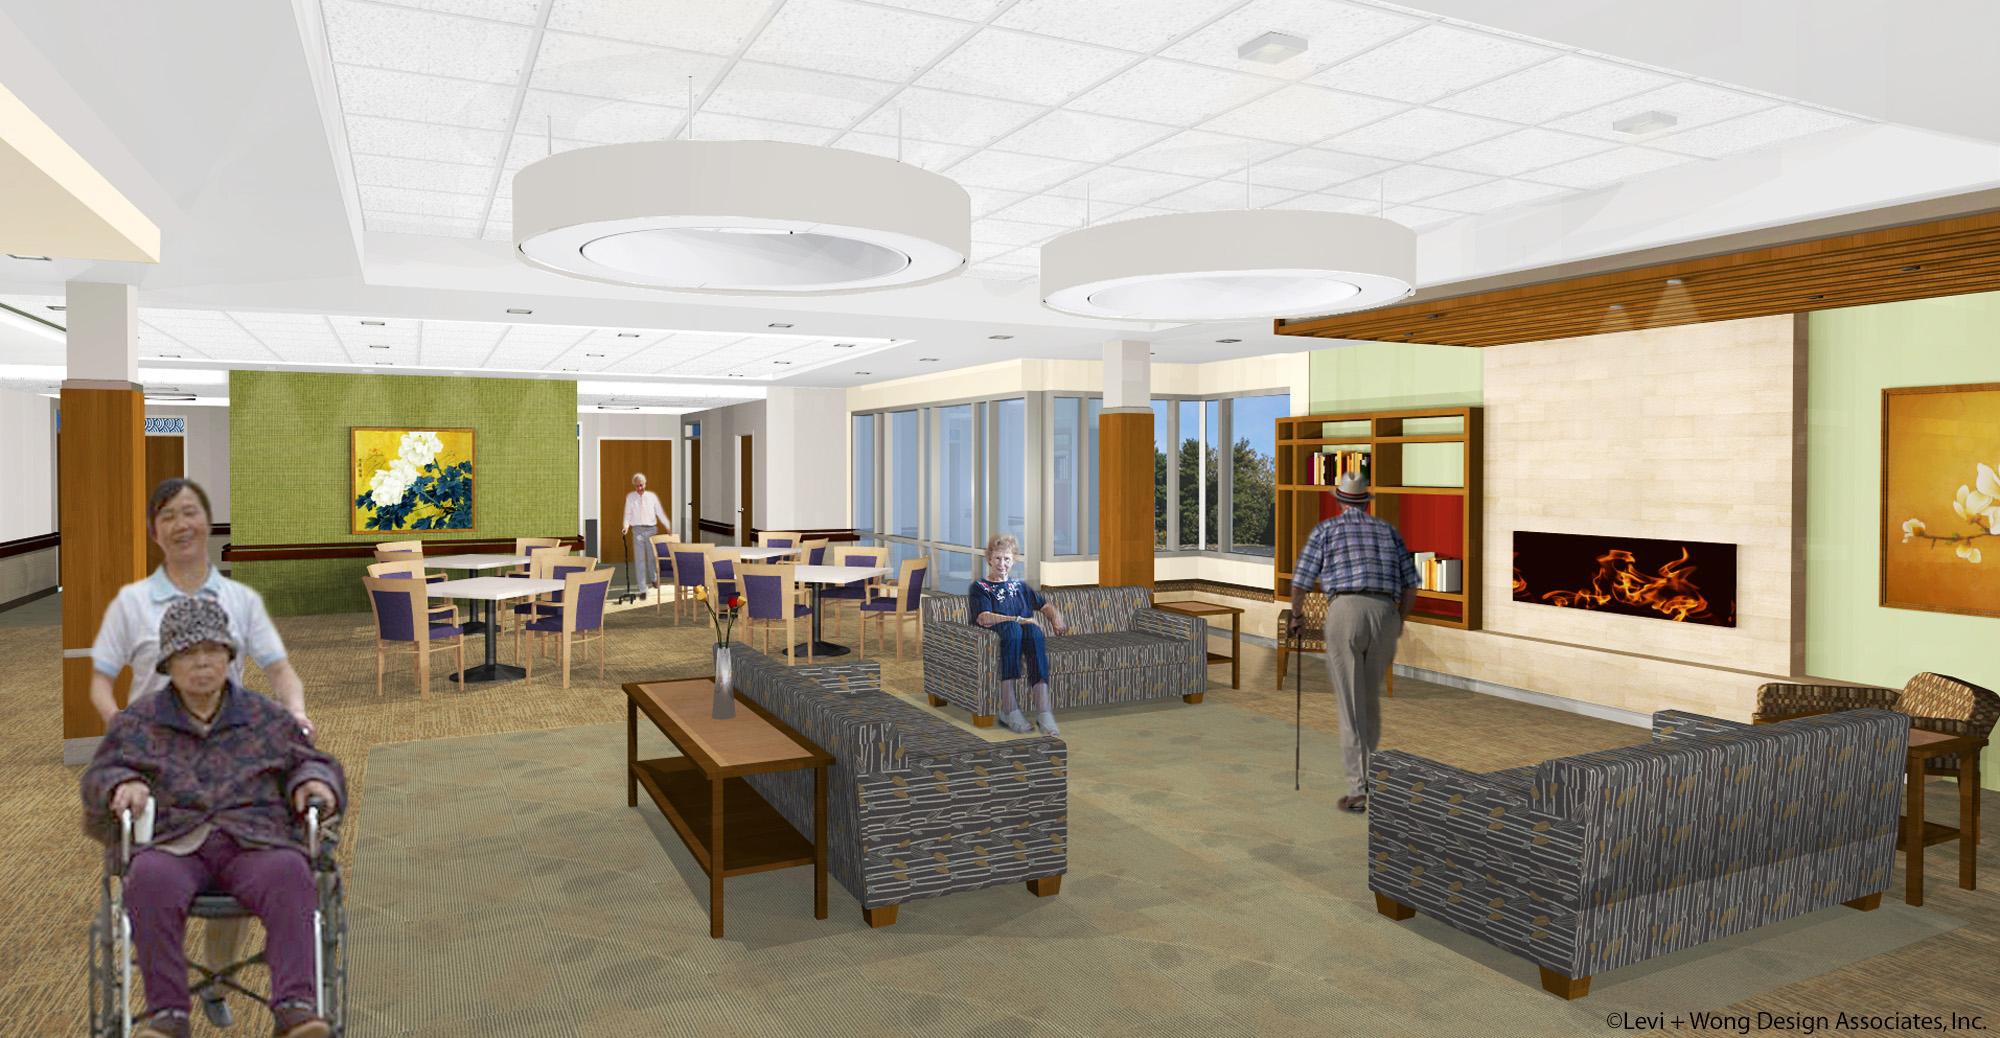 South Cove Manor Nursing Home Expands High Profile